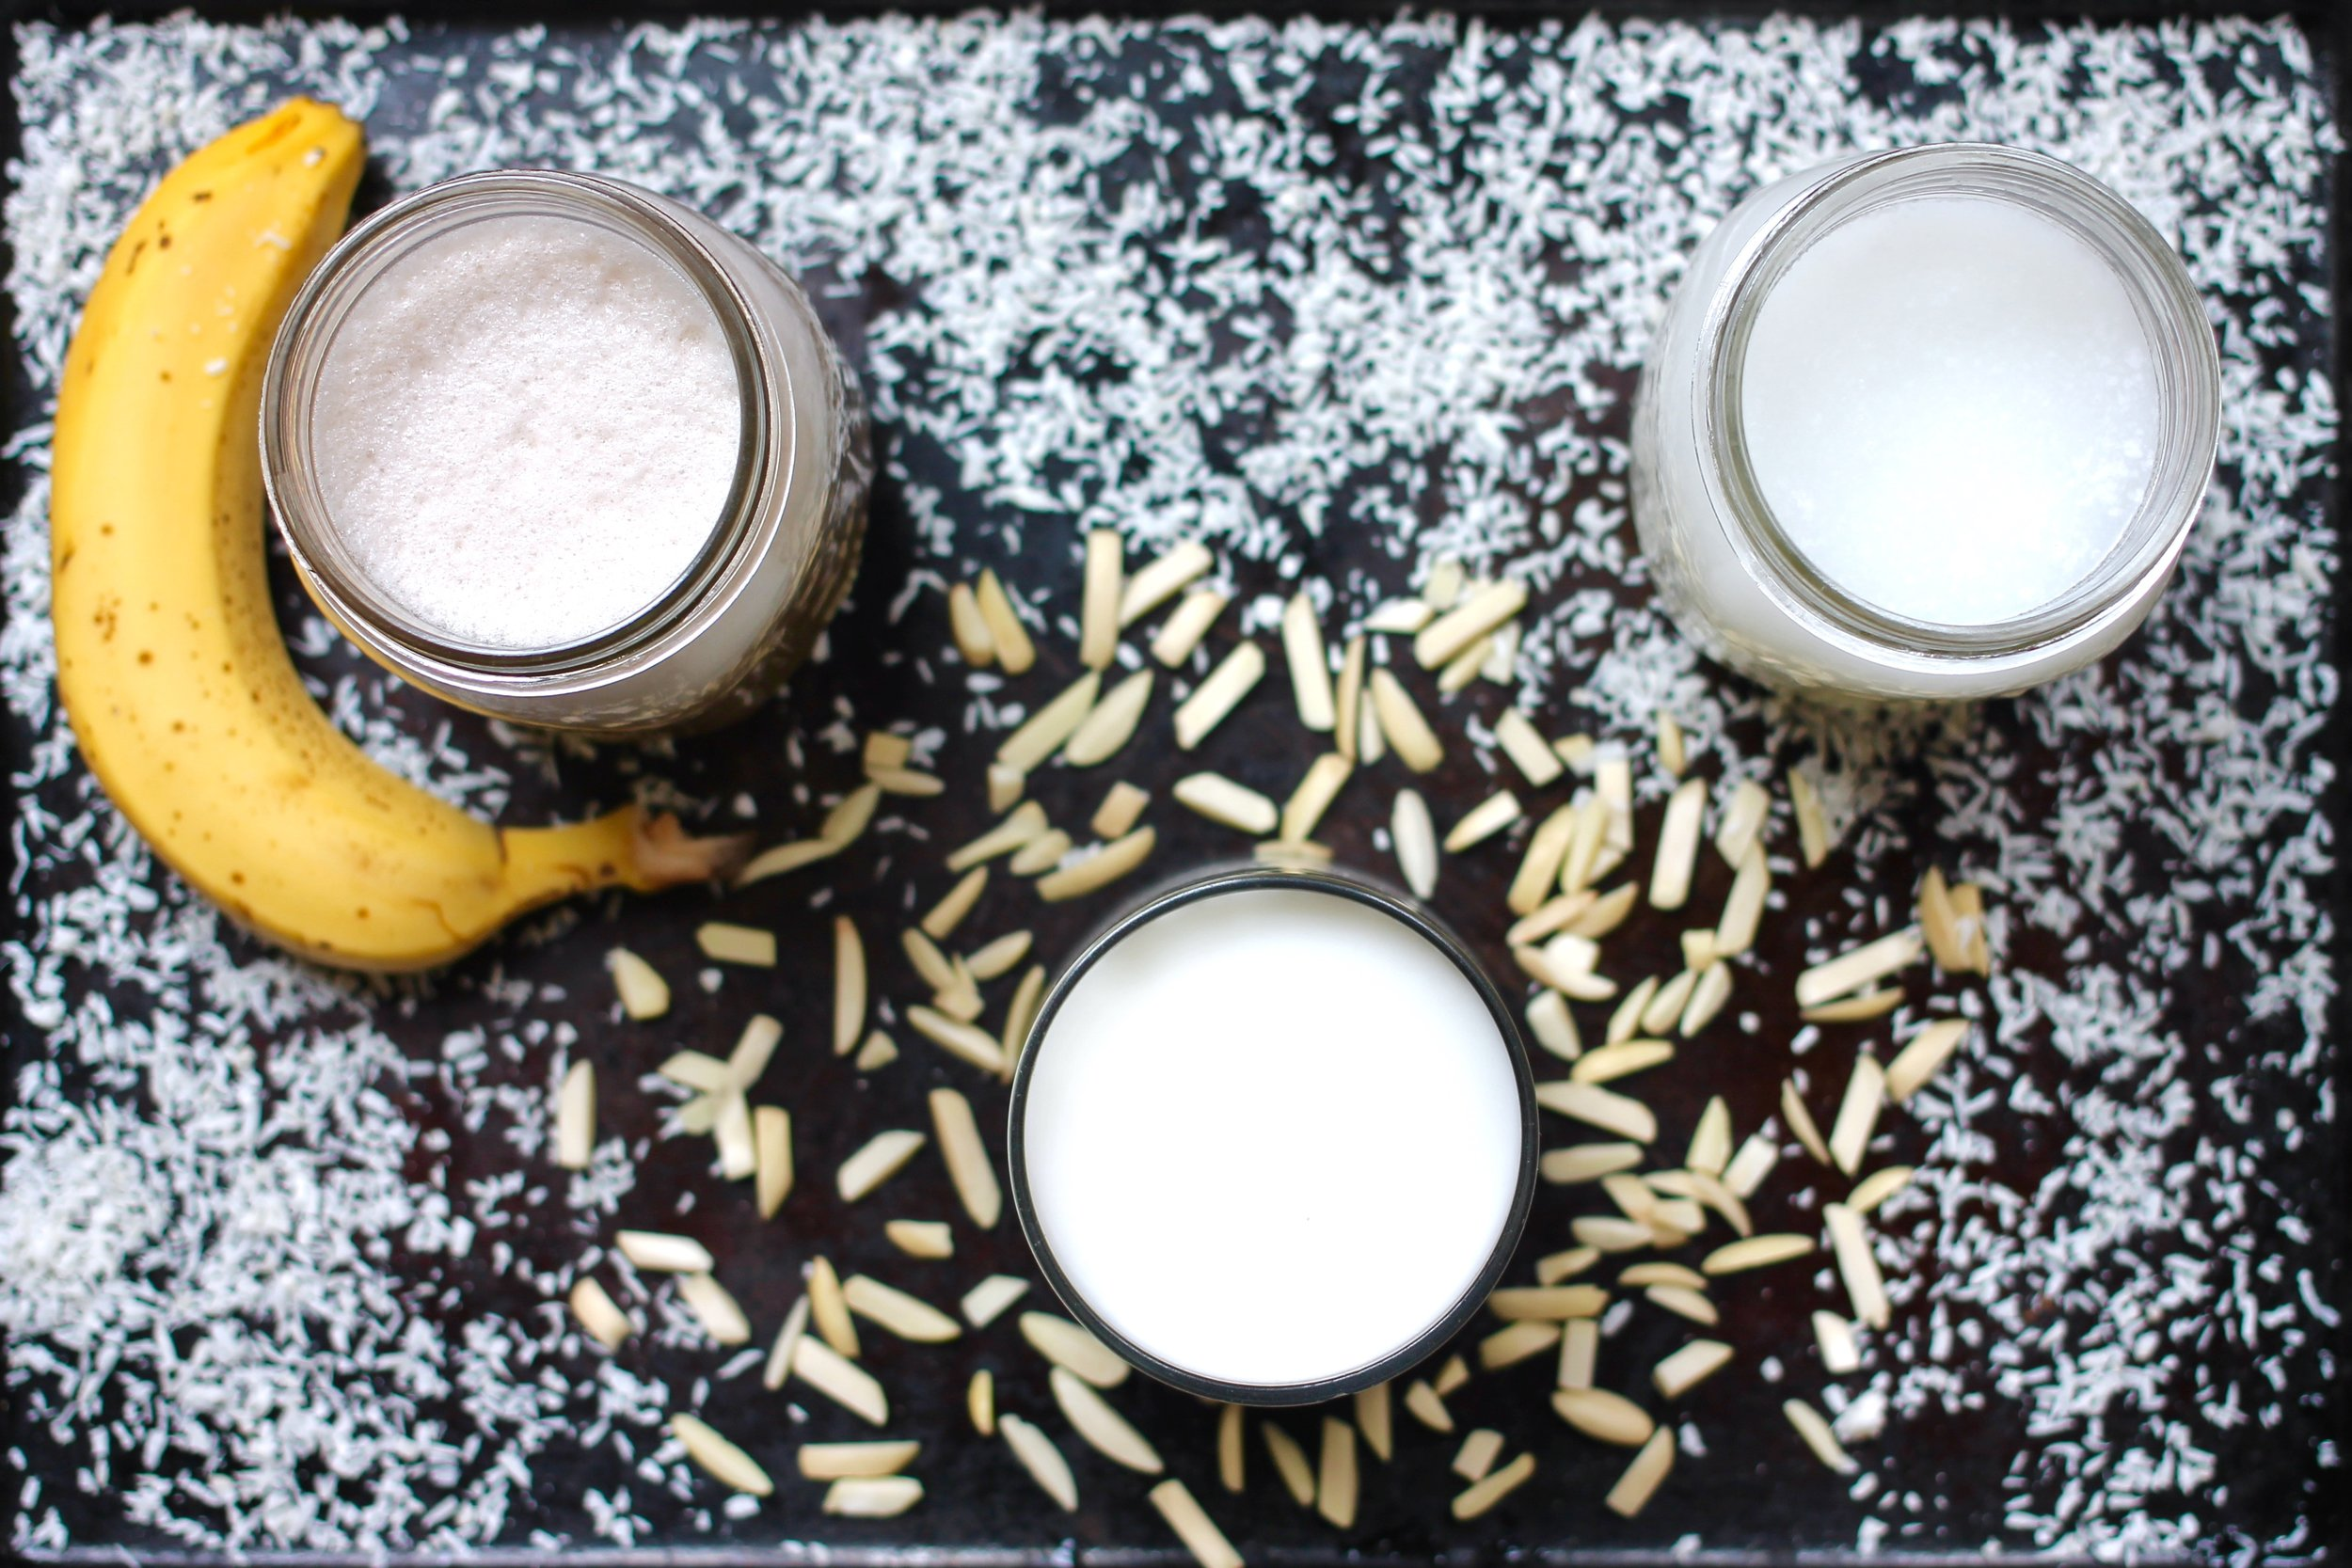 Banana Milk, Almond Milk, and Coconut Milk